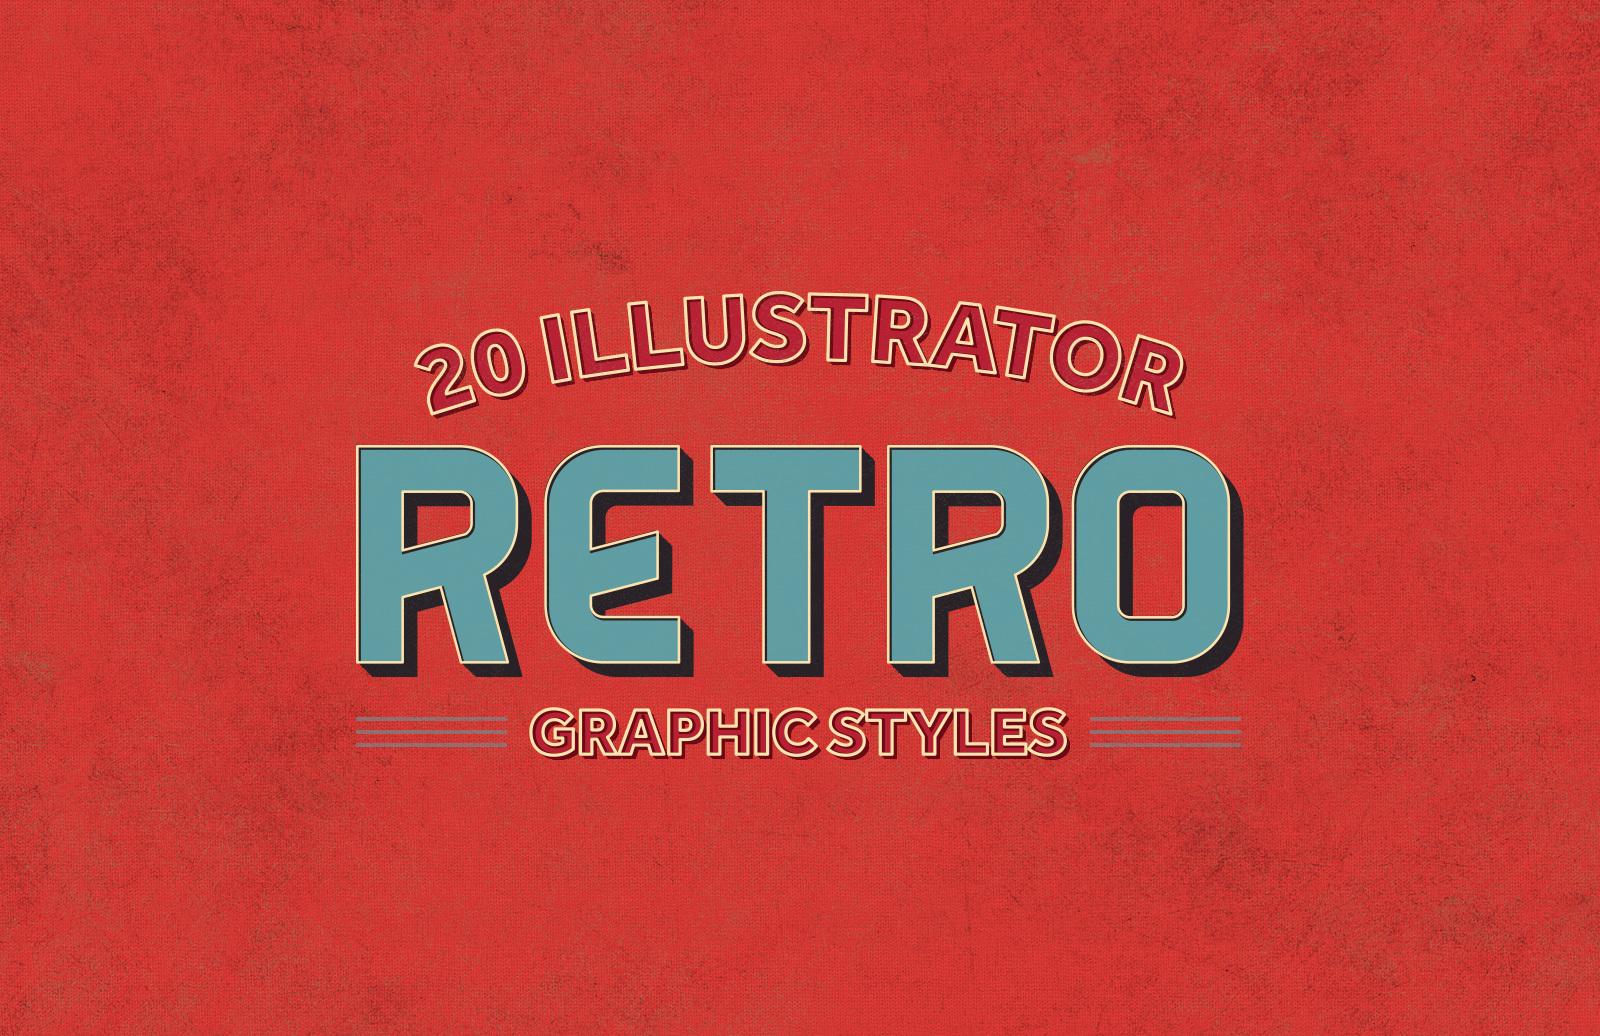 20 Illustrator Retro Graphic Styles 1